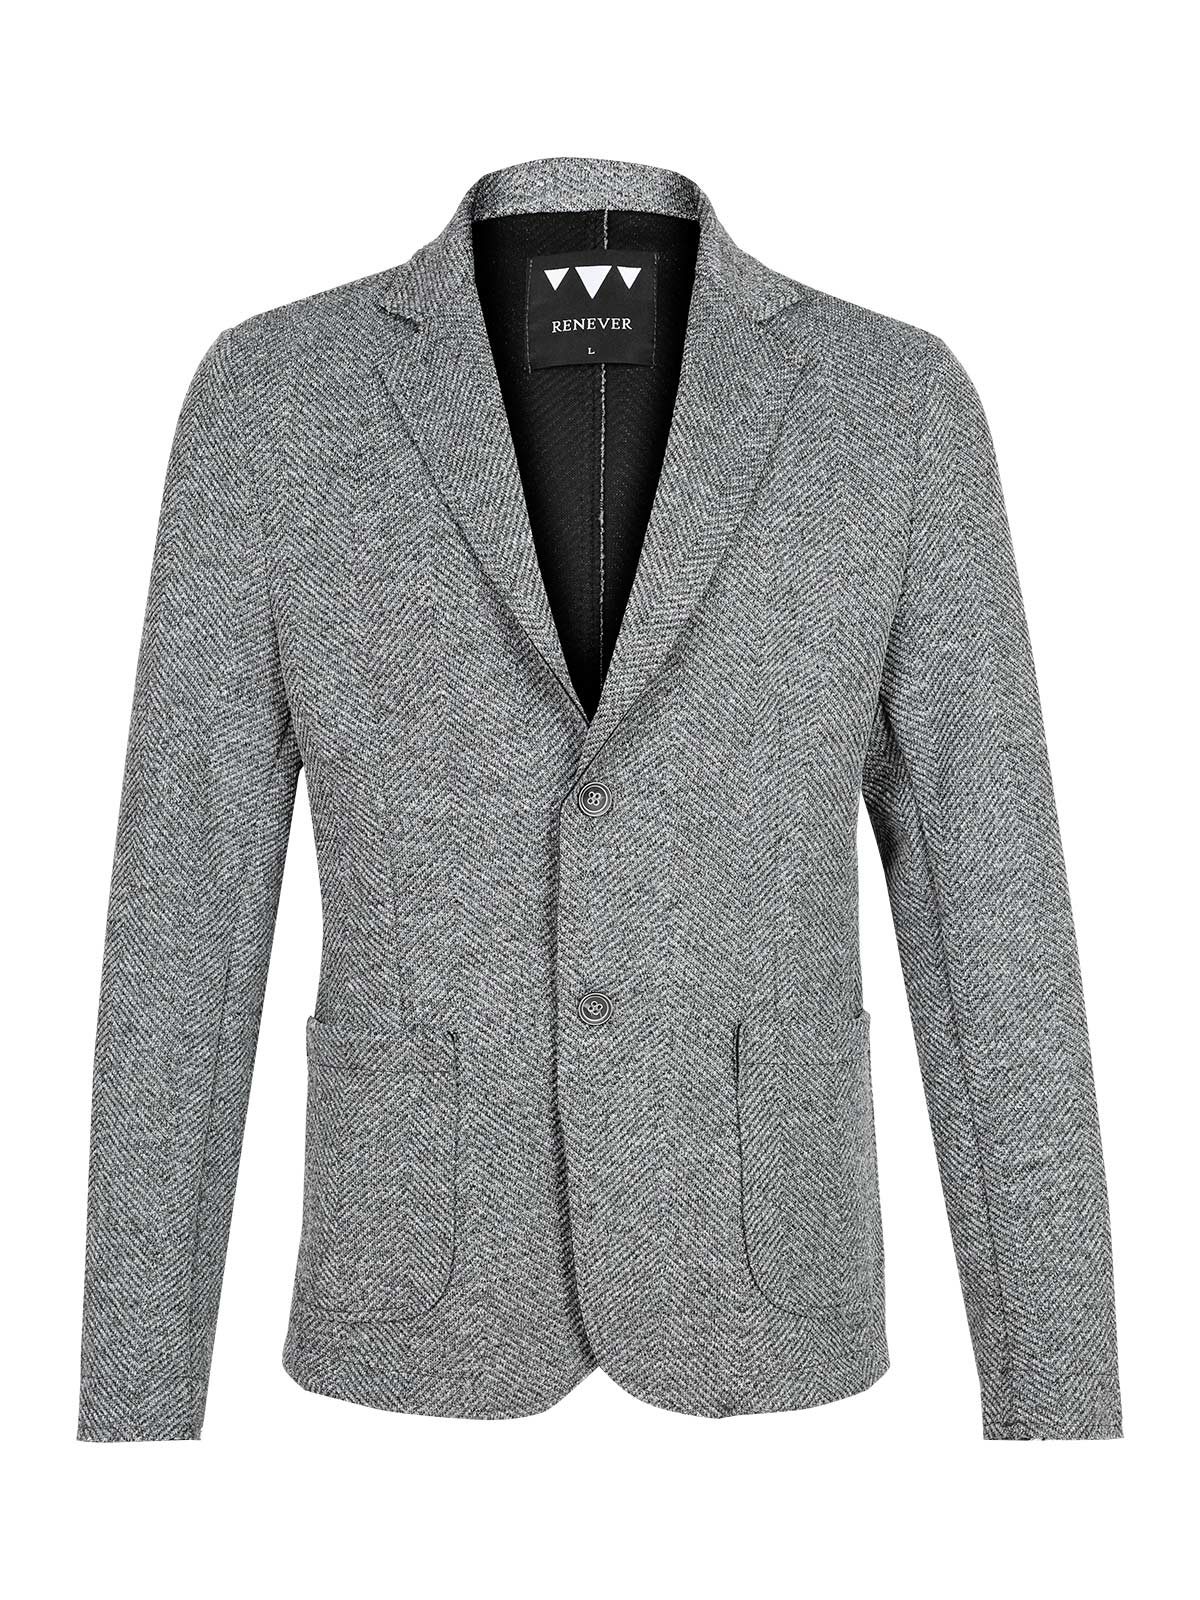 Jacket Blazer Casual Gray